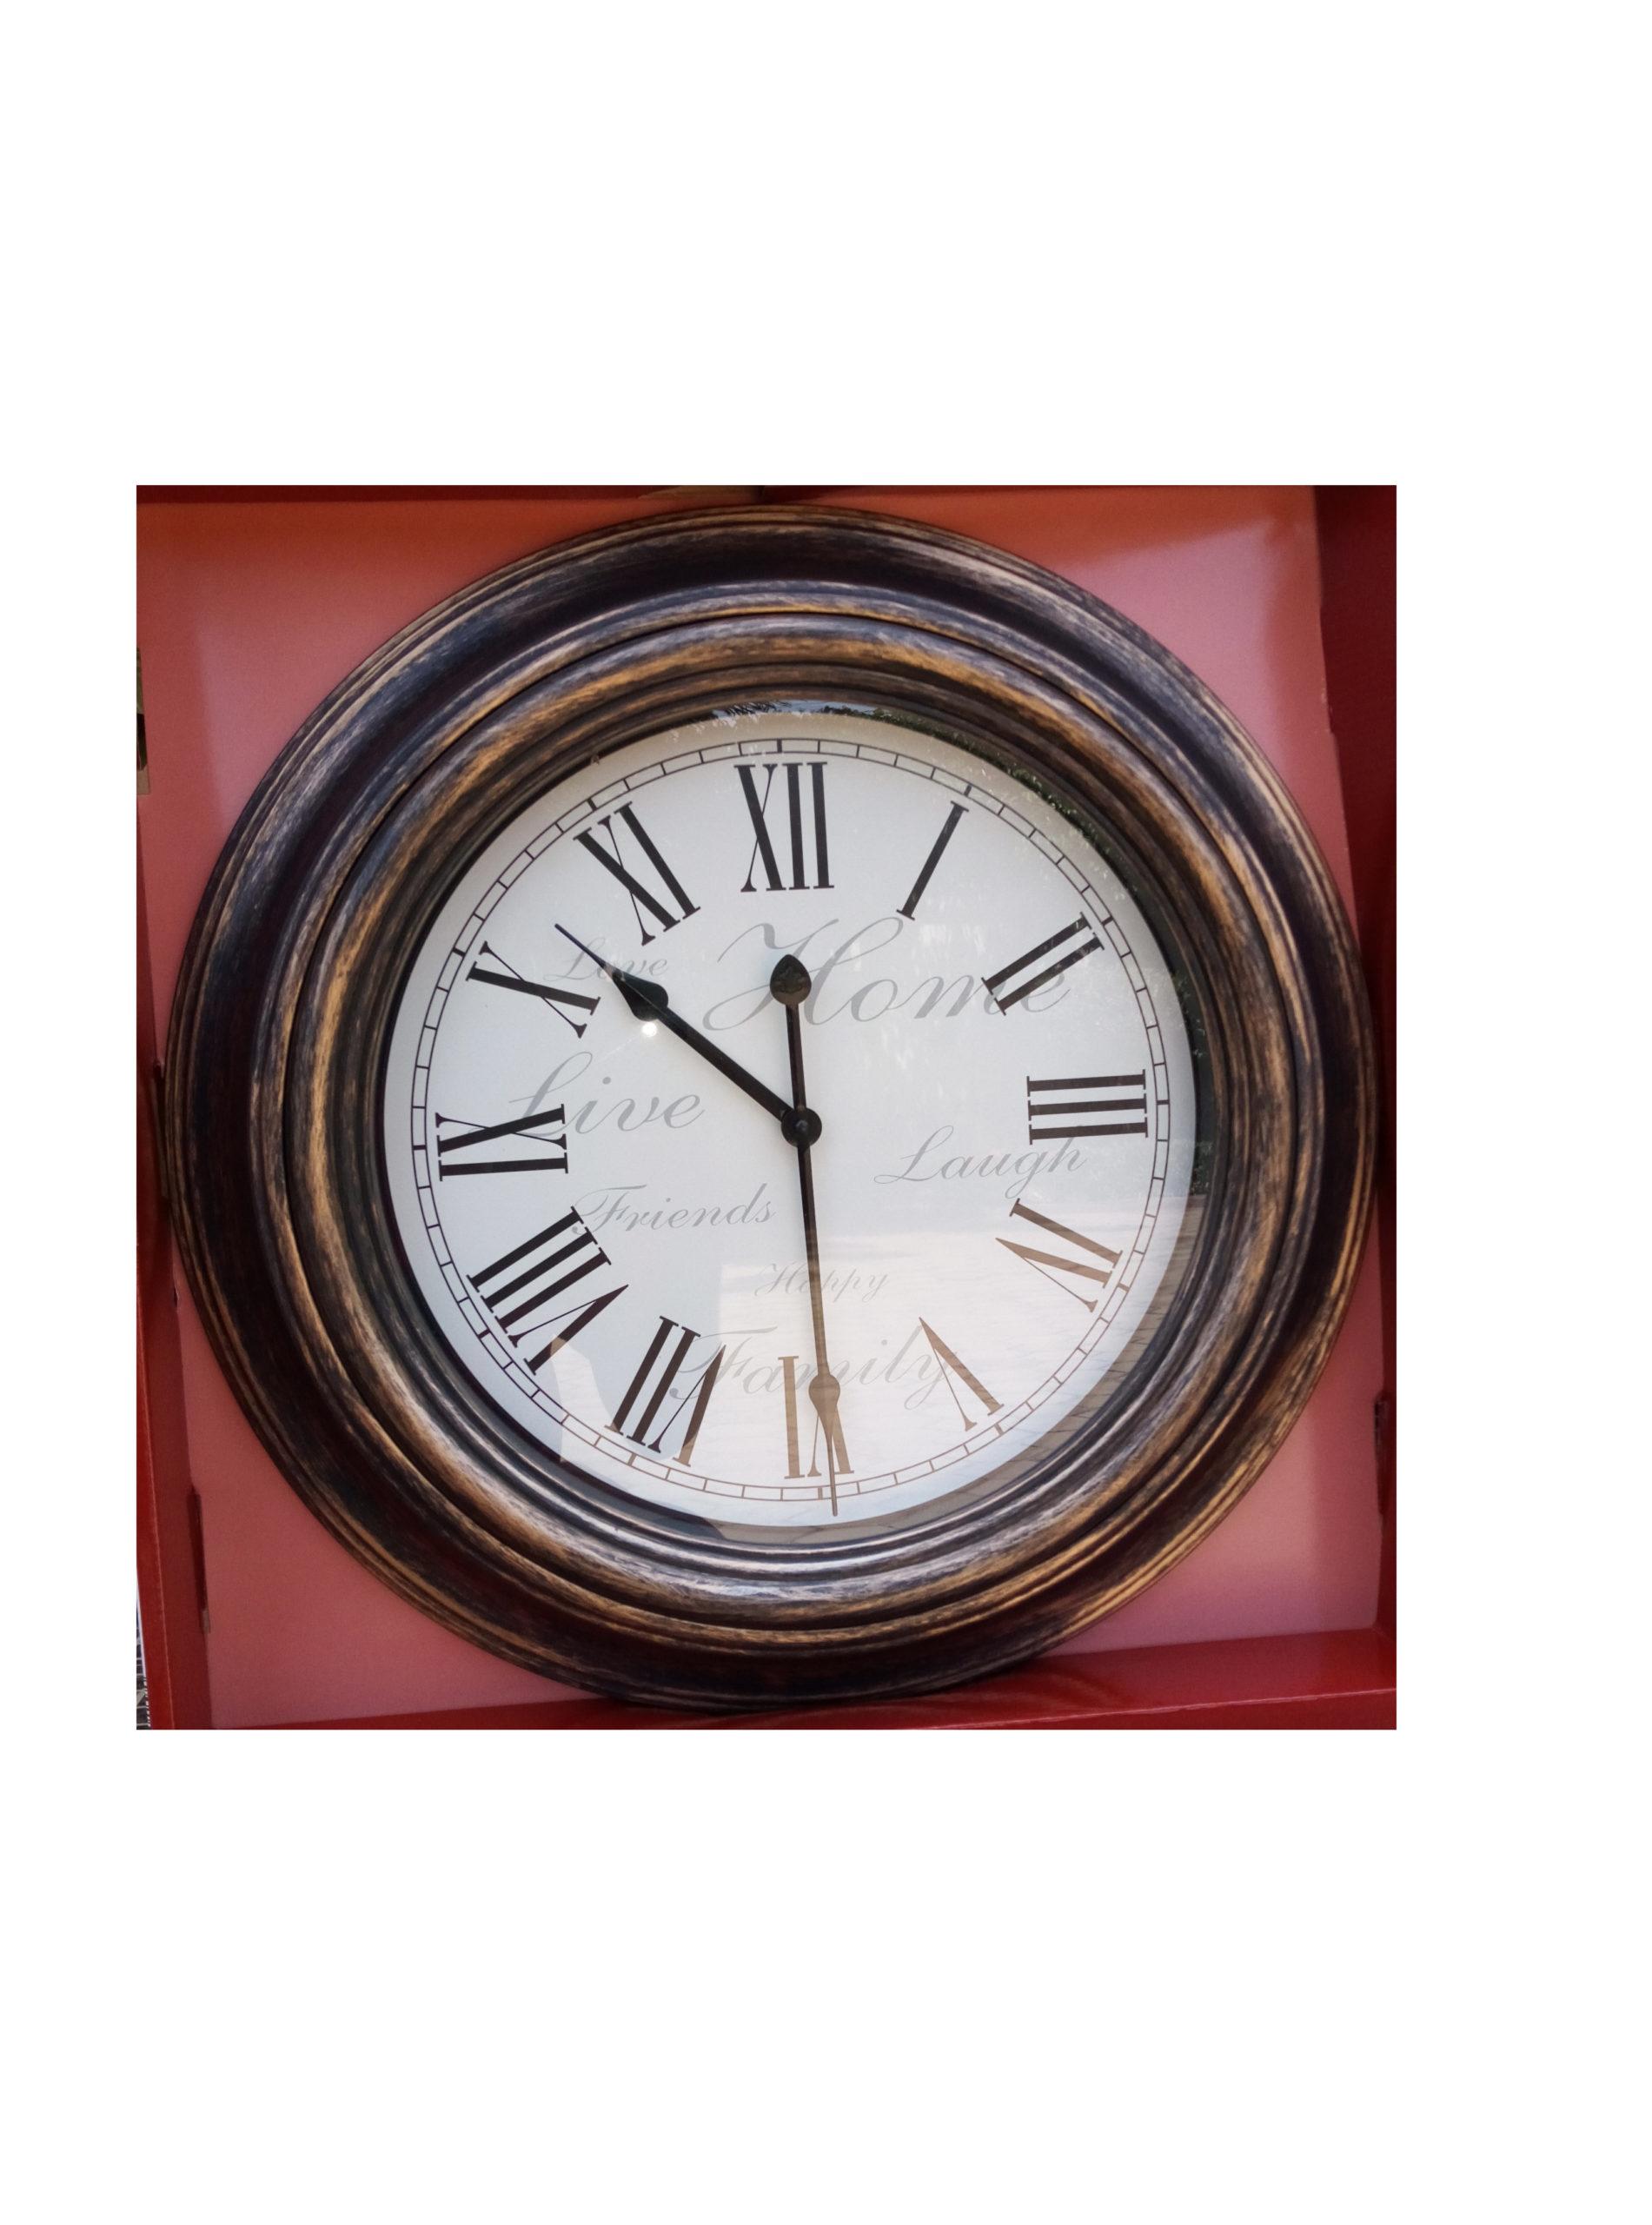 Huntington Home 20 Wall Clock Rustic Nortram Retail